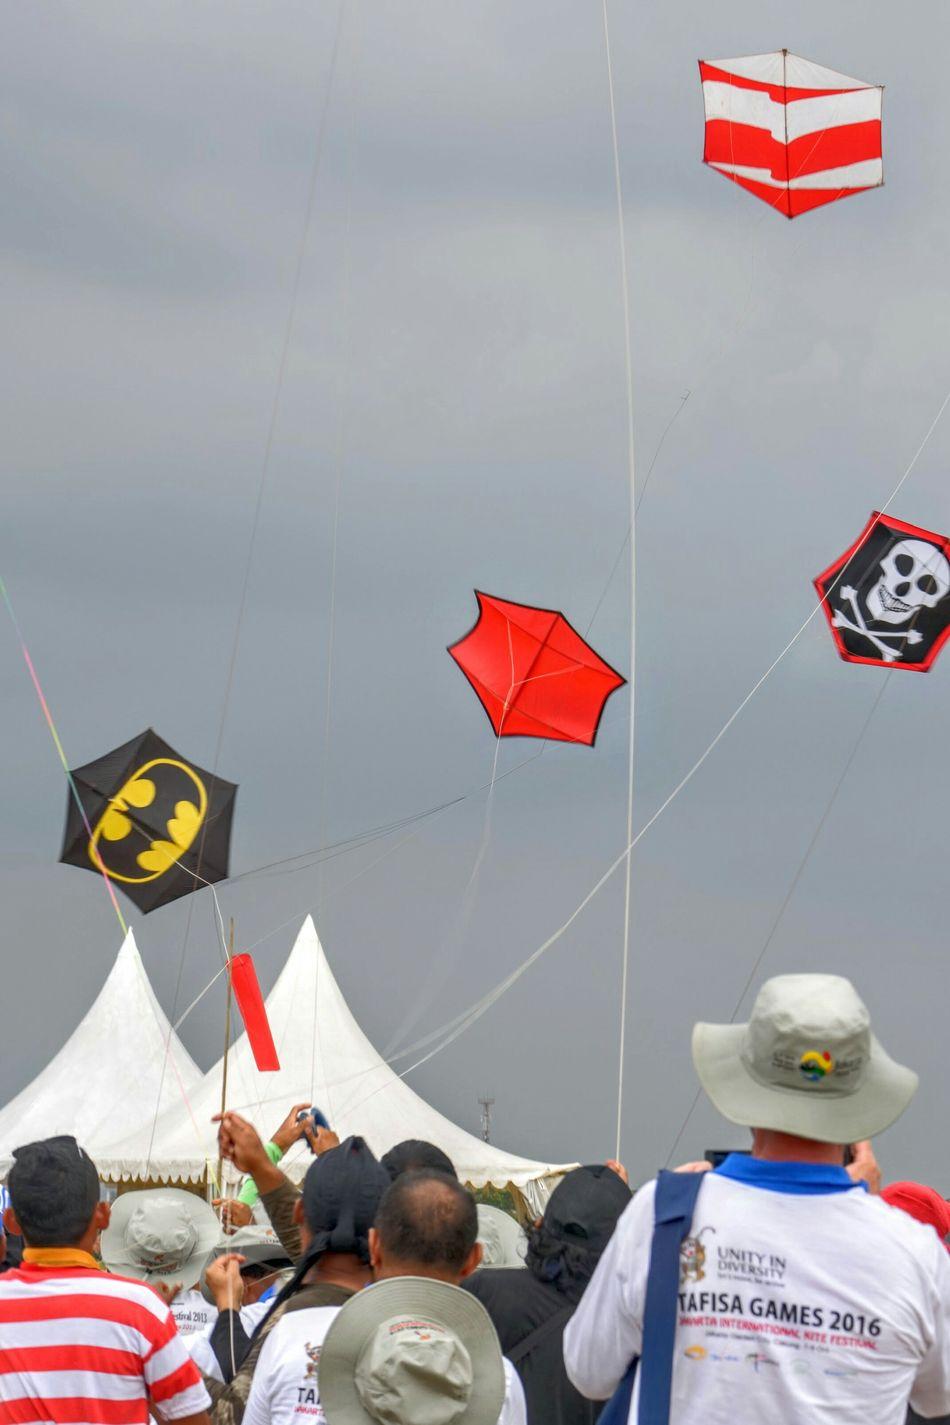 Flying Kite Hanging People Unity Cloud - Sky Flying Kite - Toy Outdoors Flying A Kite Kiteflying Kite Festival Unityindiversity Fighting Kite Rokakku EyeEm Diversity